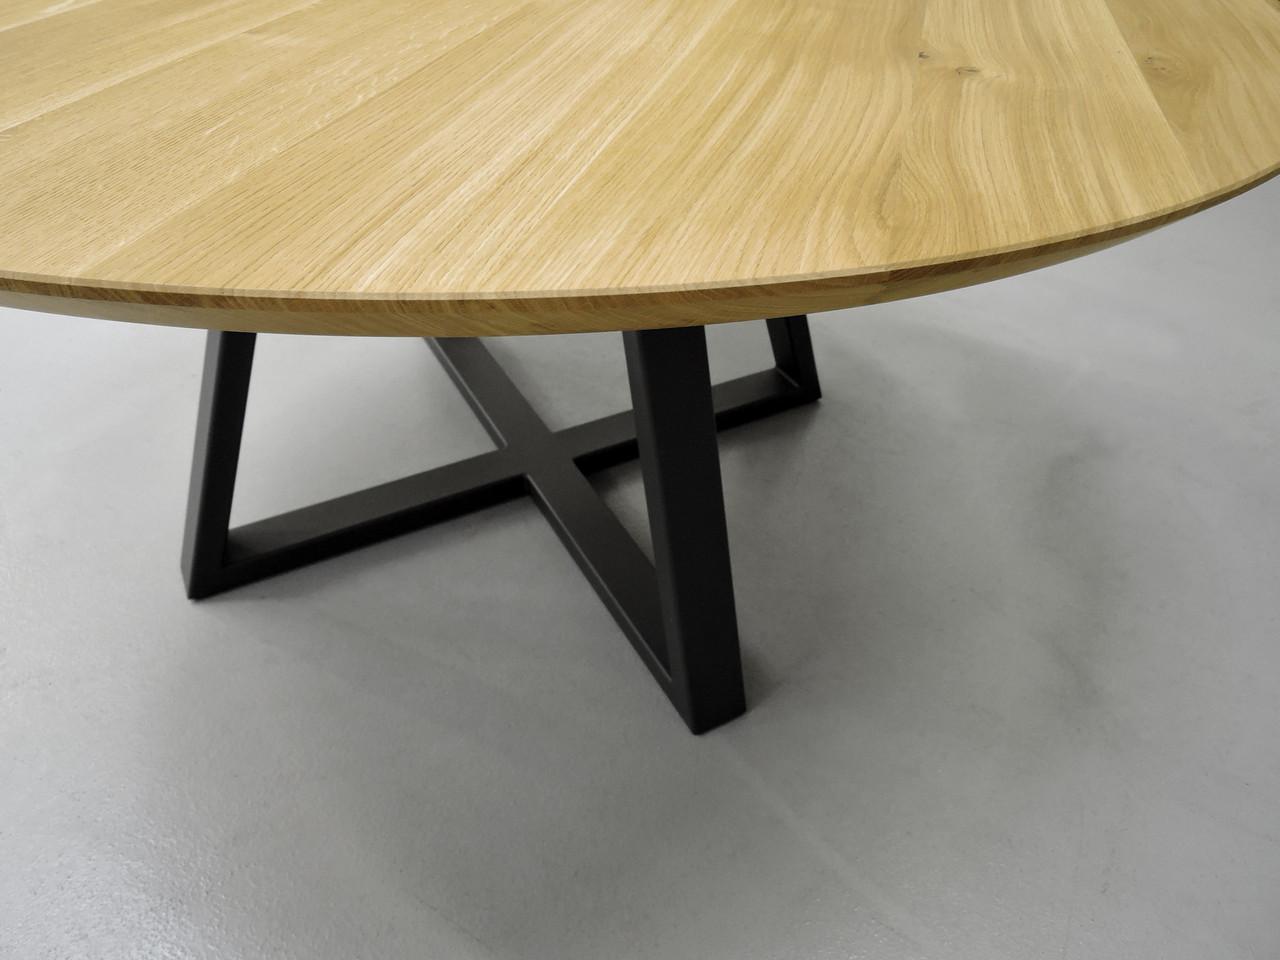 artmeta_table_ronde_x_en____bois_massif_1_copier.jpg